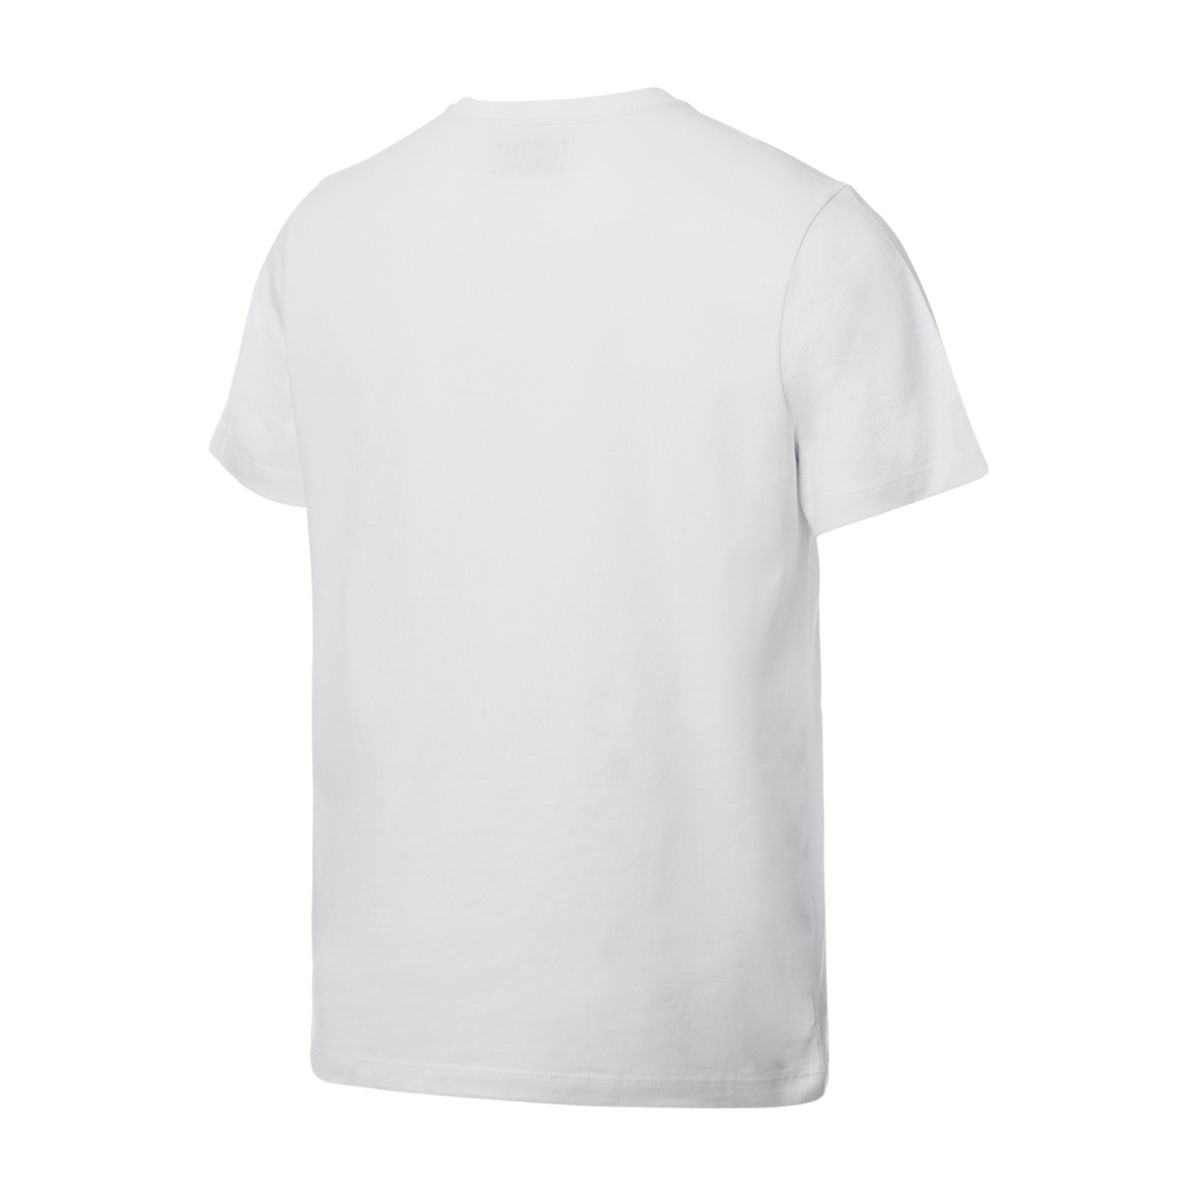 Camisa Casual Retrô Gol Torcedor Chapecoense Branca